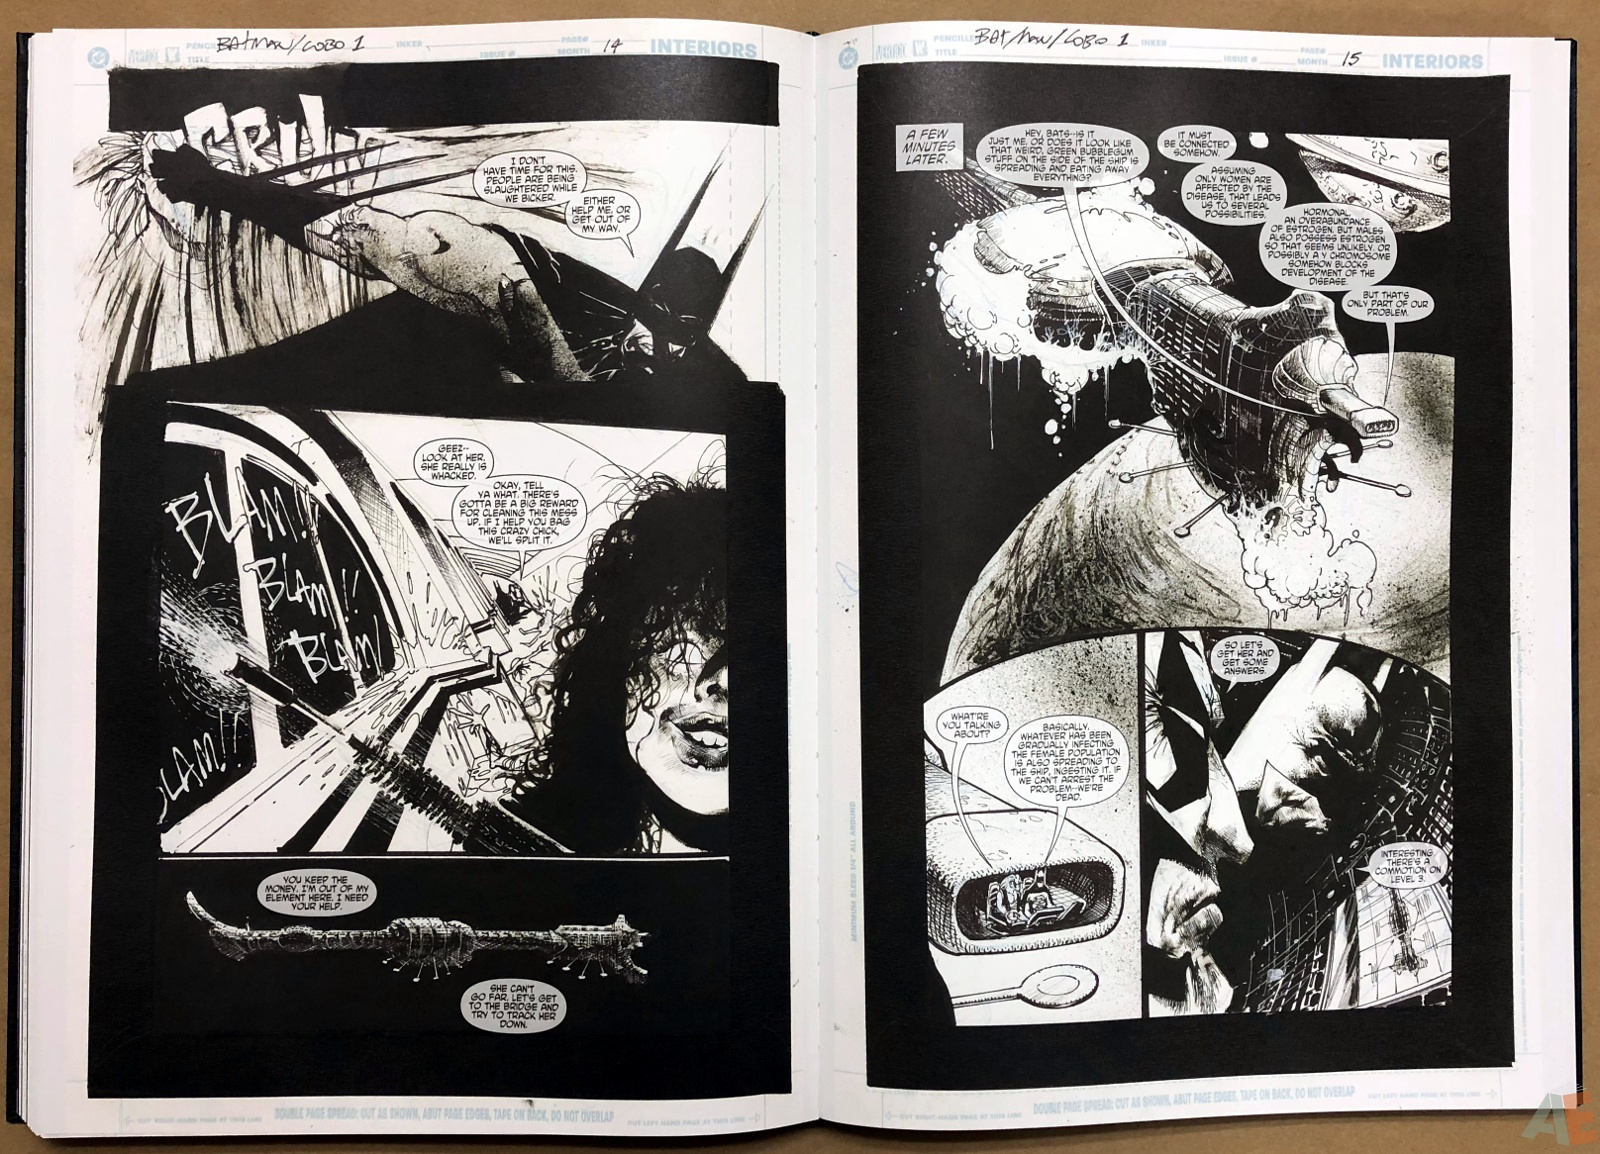 Batman: Secrets – Sam Kieth Gallery Edition 37